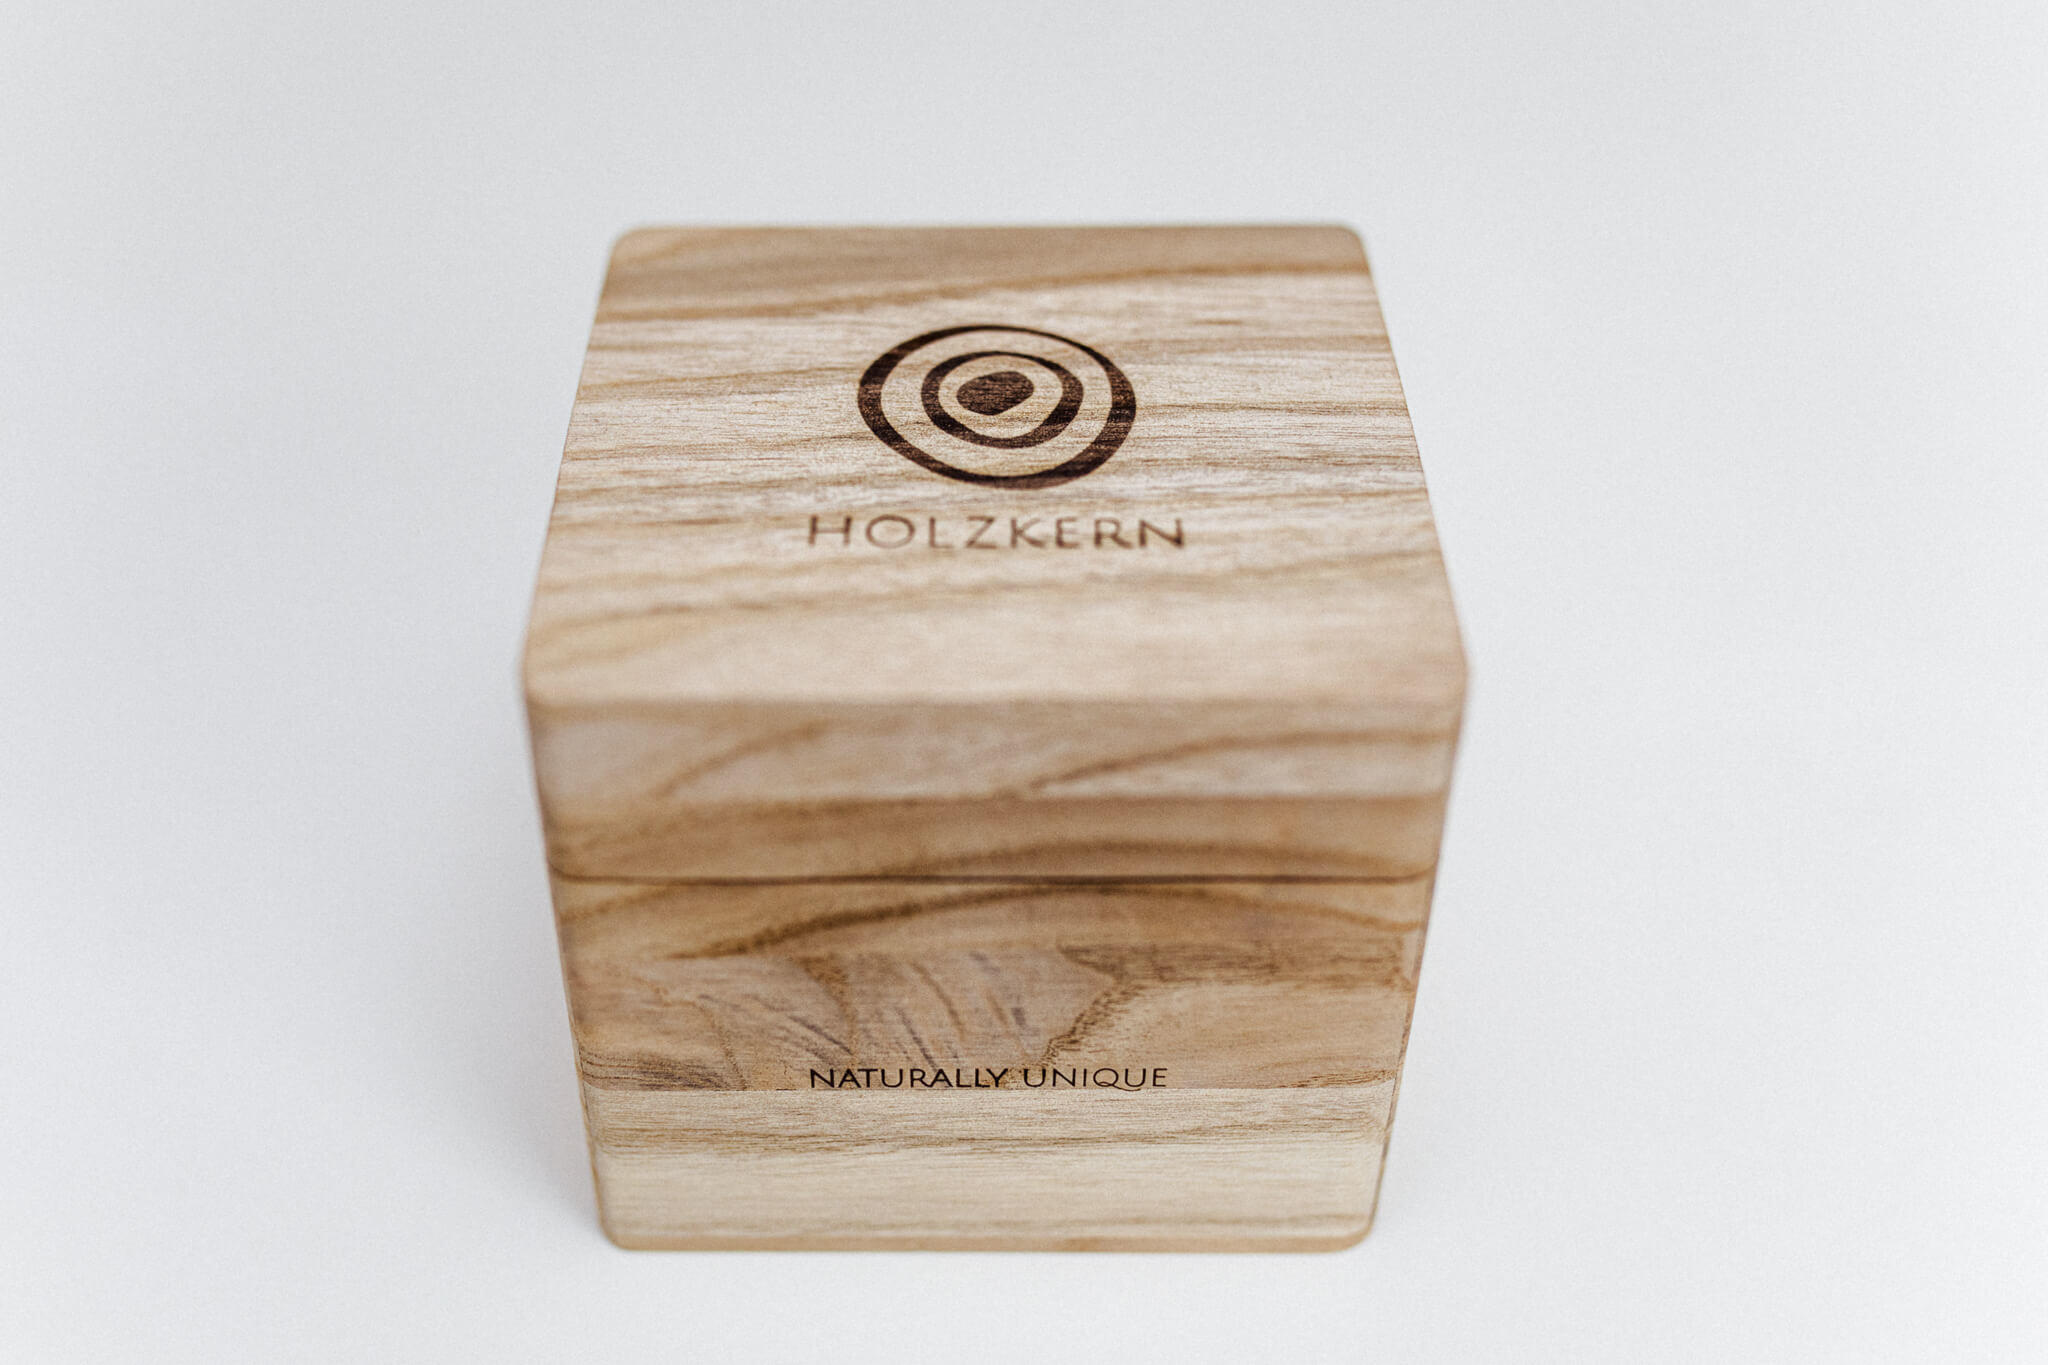 Holzkern Verpackung